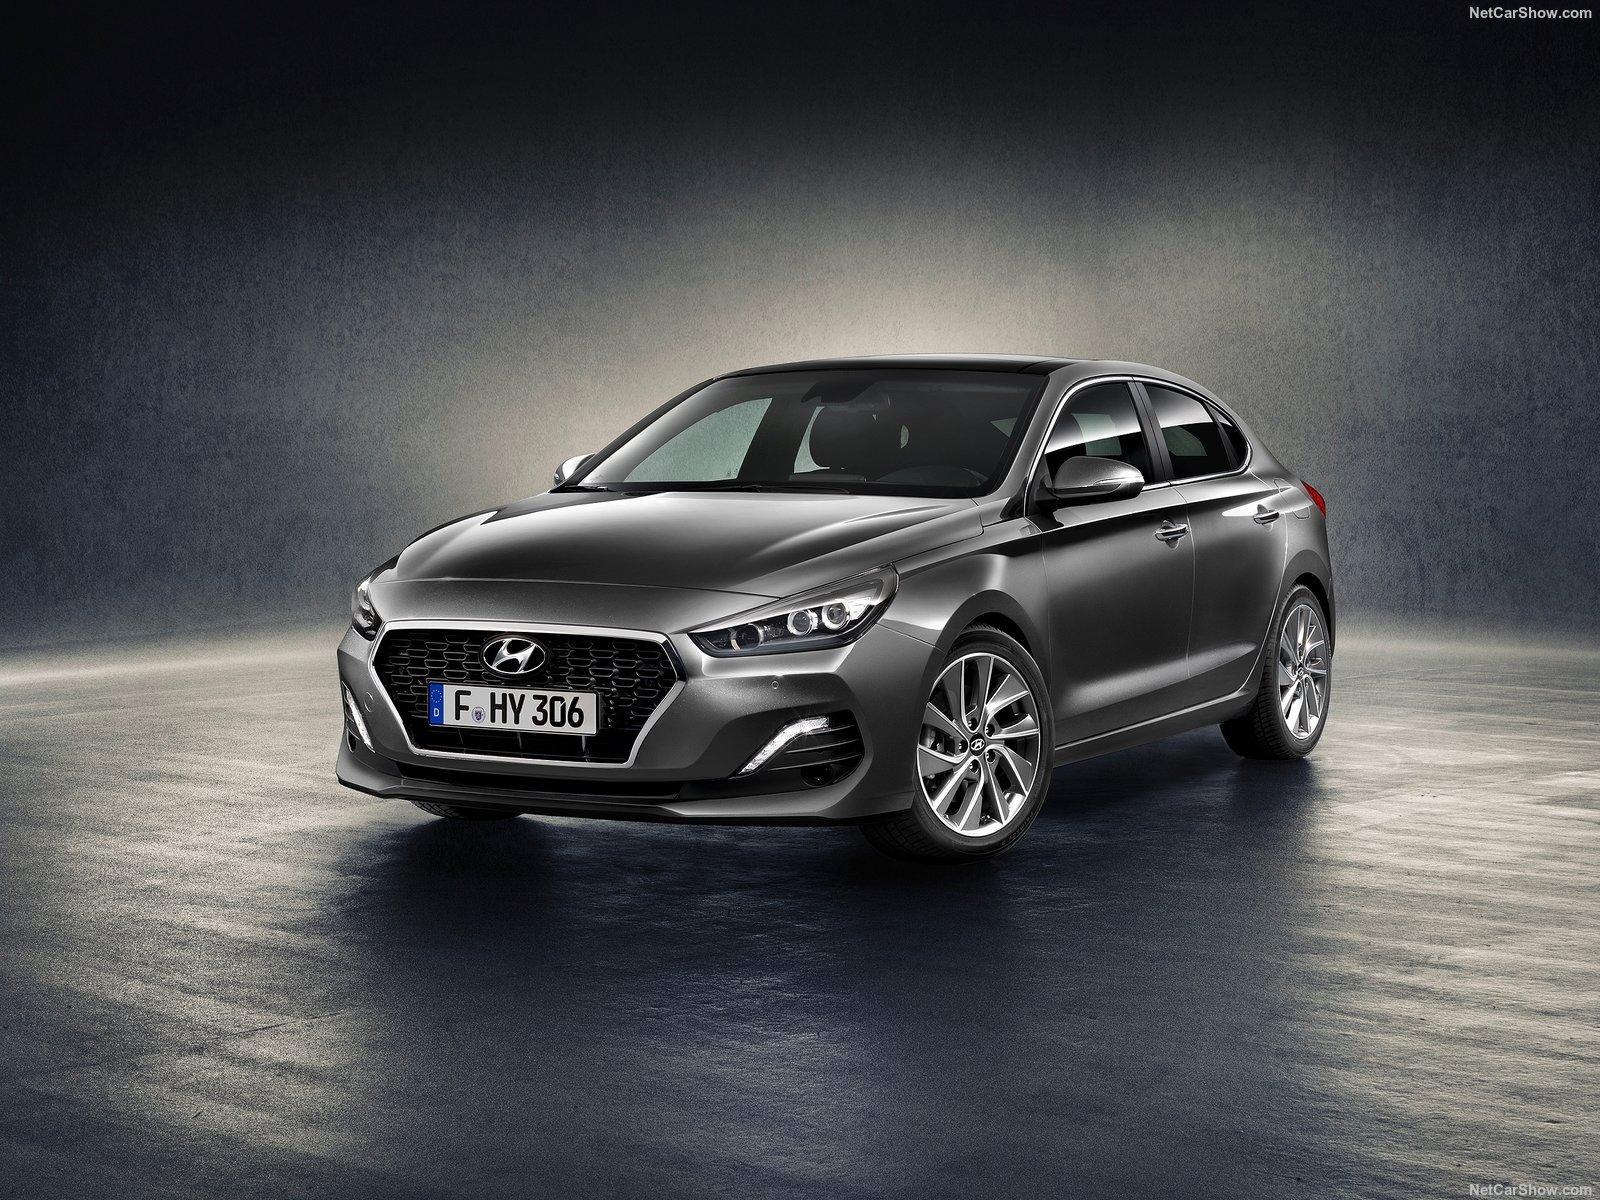 Hyundai i30 Fastback je realitou - po krku půjde Octavii